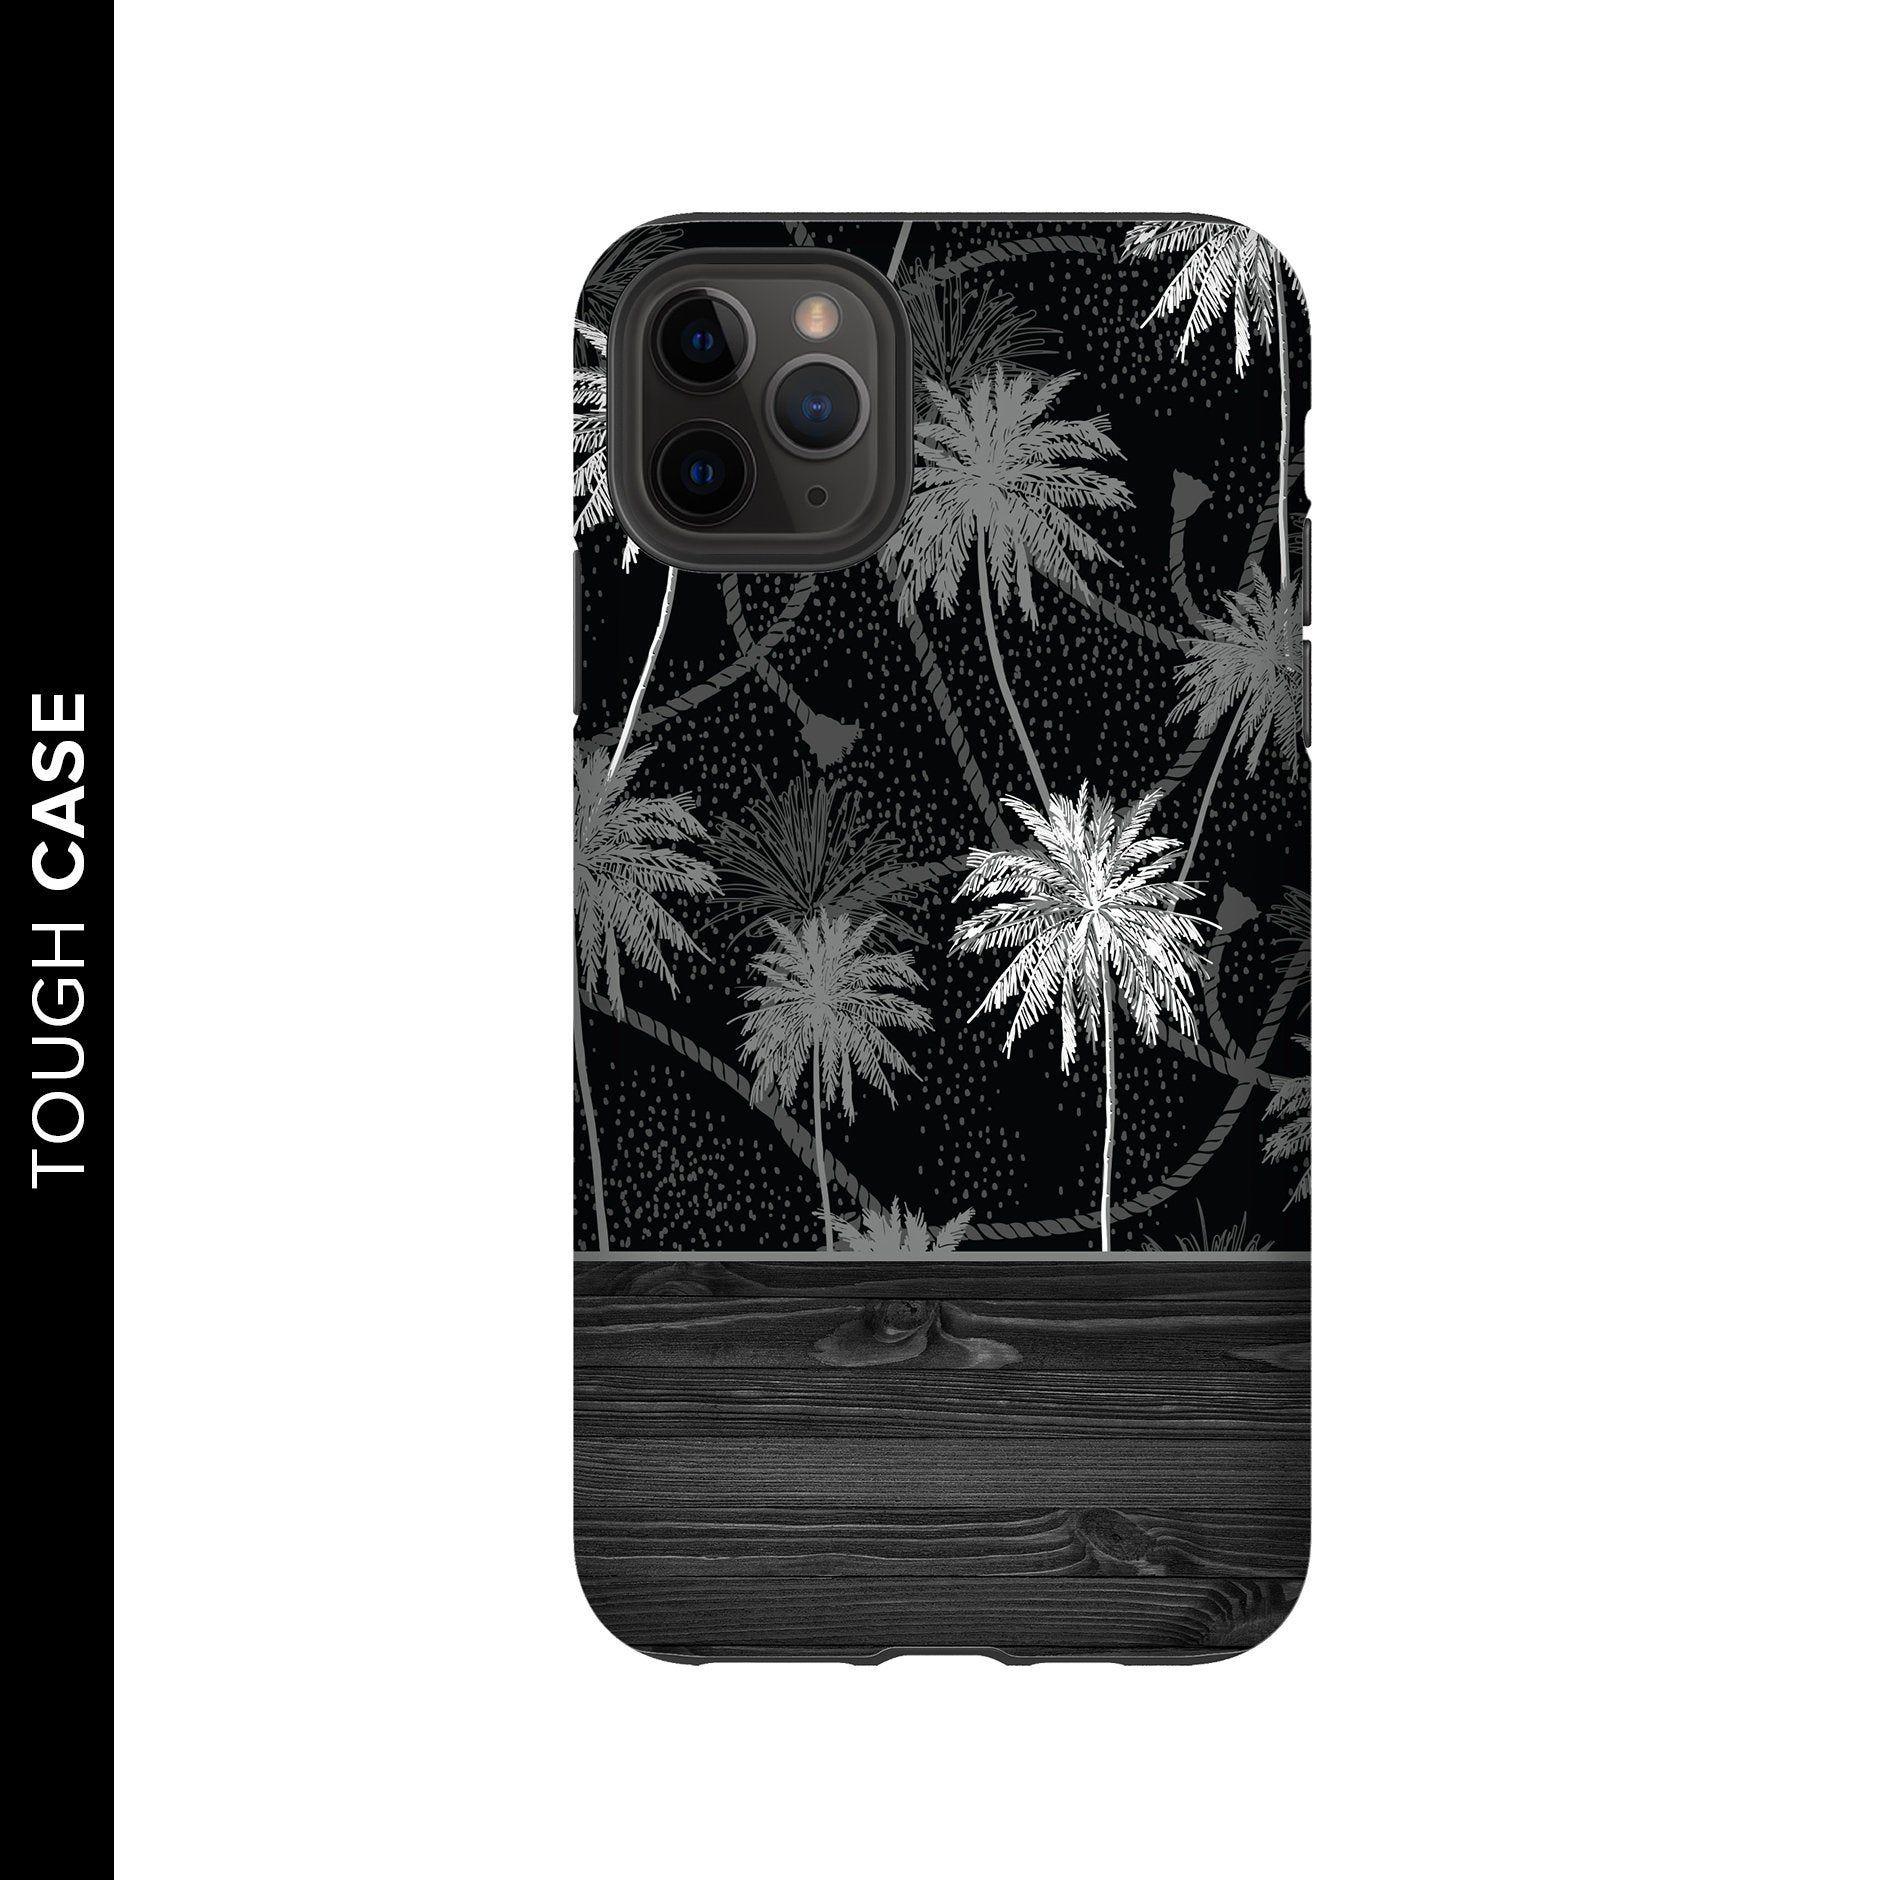 Monochrome Palm Trees Phone Case Palm Tree Phone Case